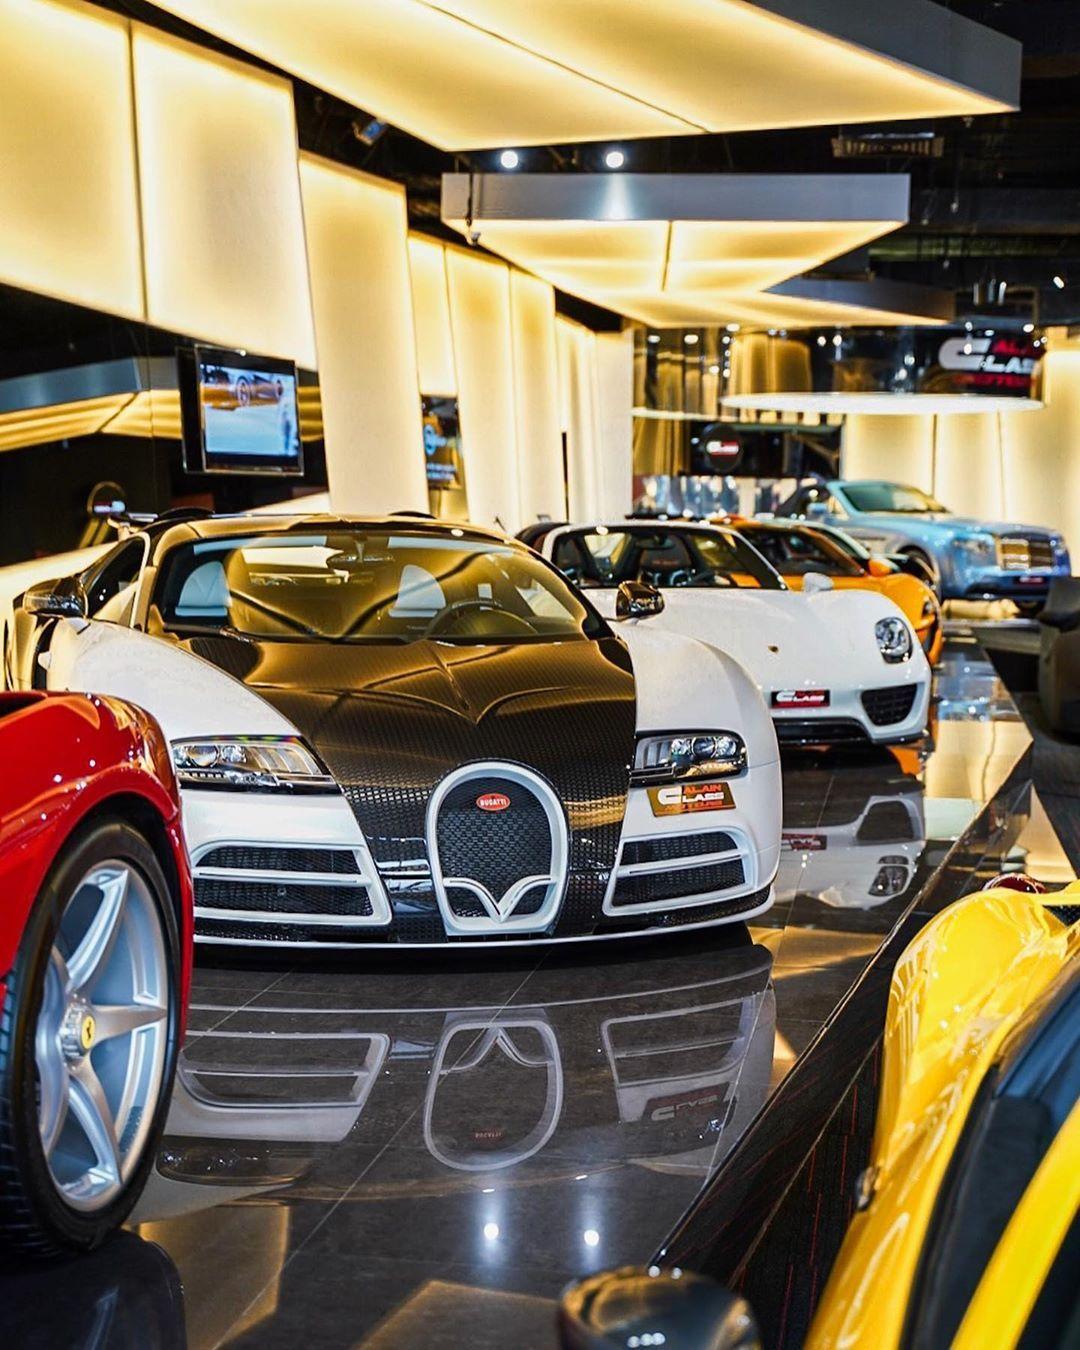 L�ks Arabaar Maybach  #cars #luxurycars #sportcars #conceptcars #motorcycles #trucks